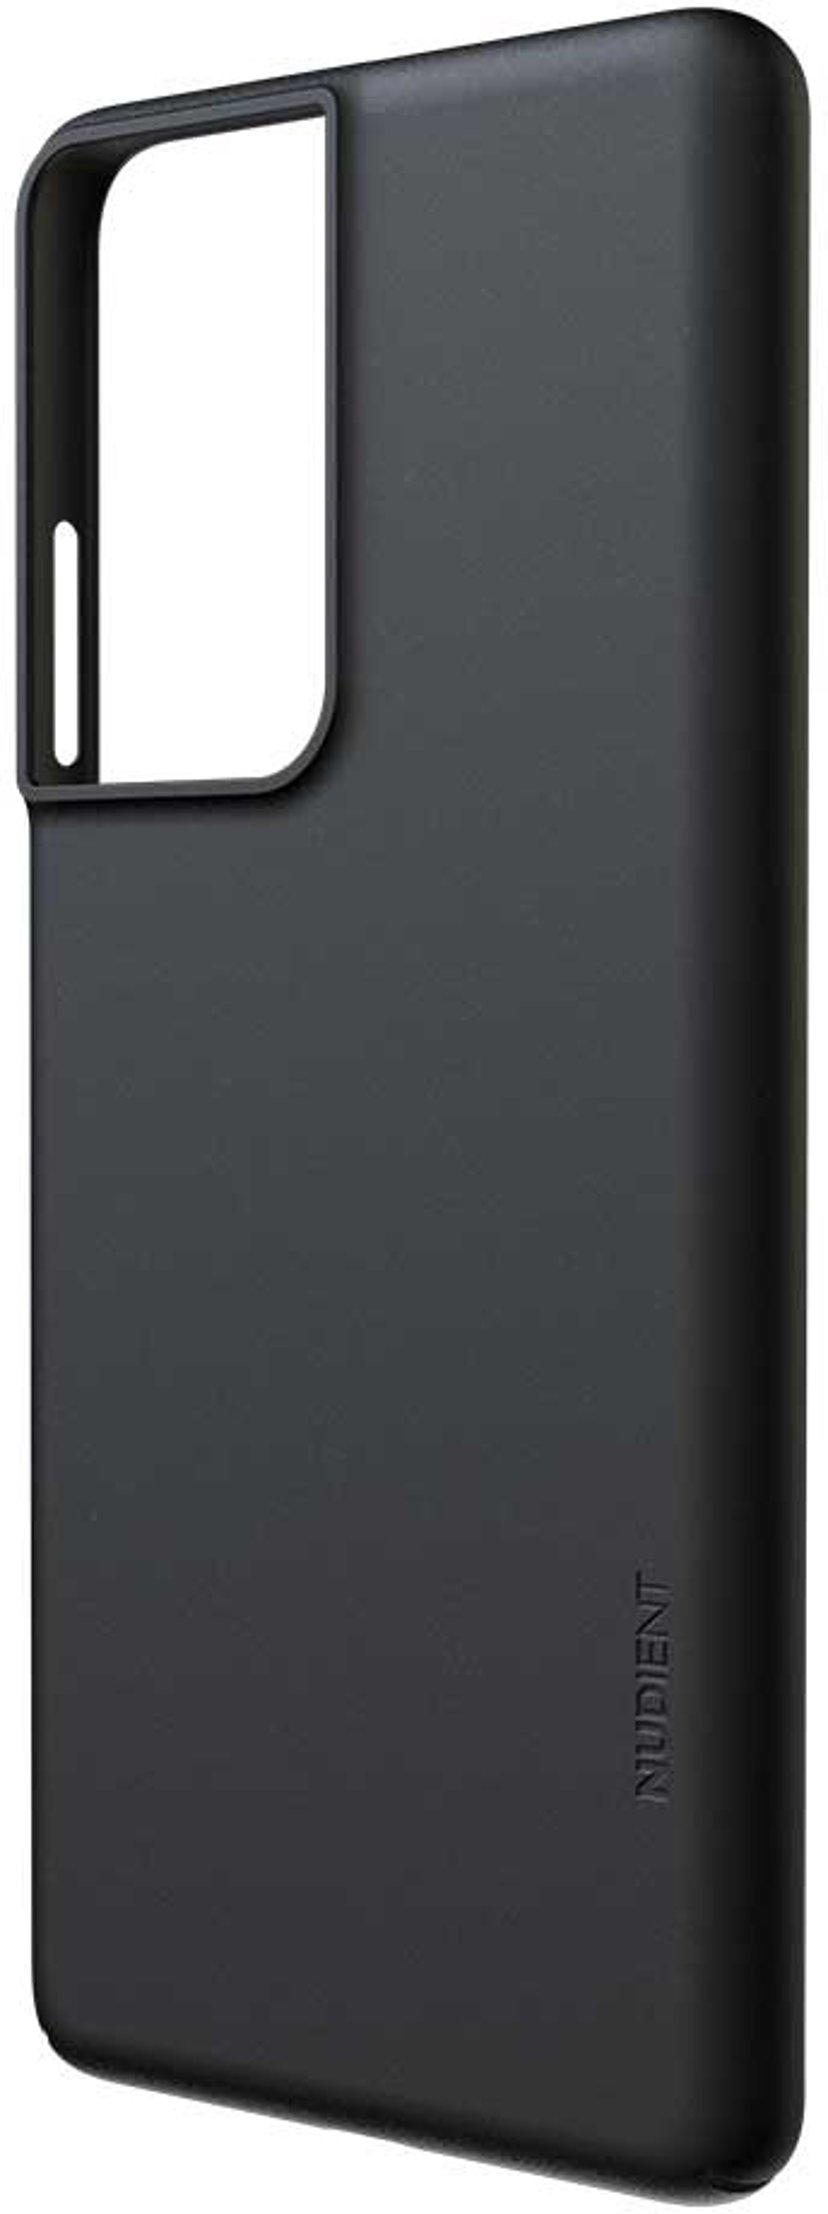 Nudient Thin Precise Case V3 Samsung Galaxy S21 Ultra Musta